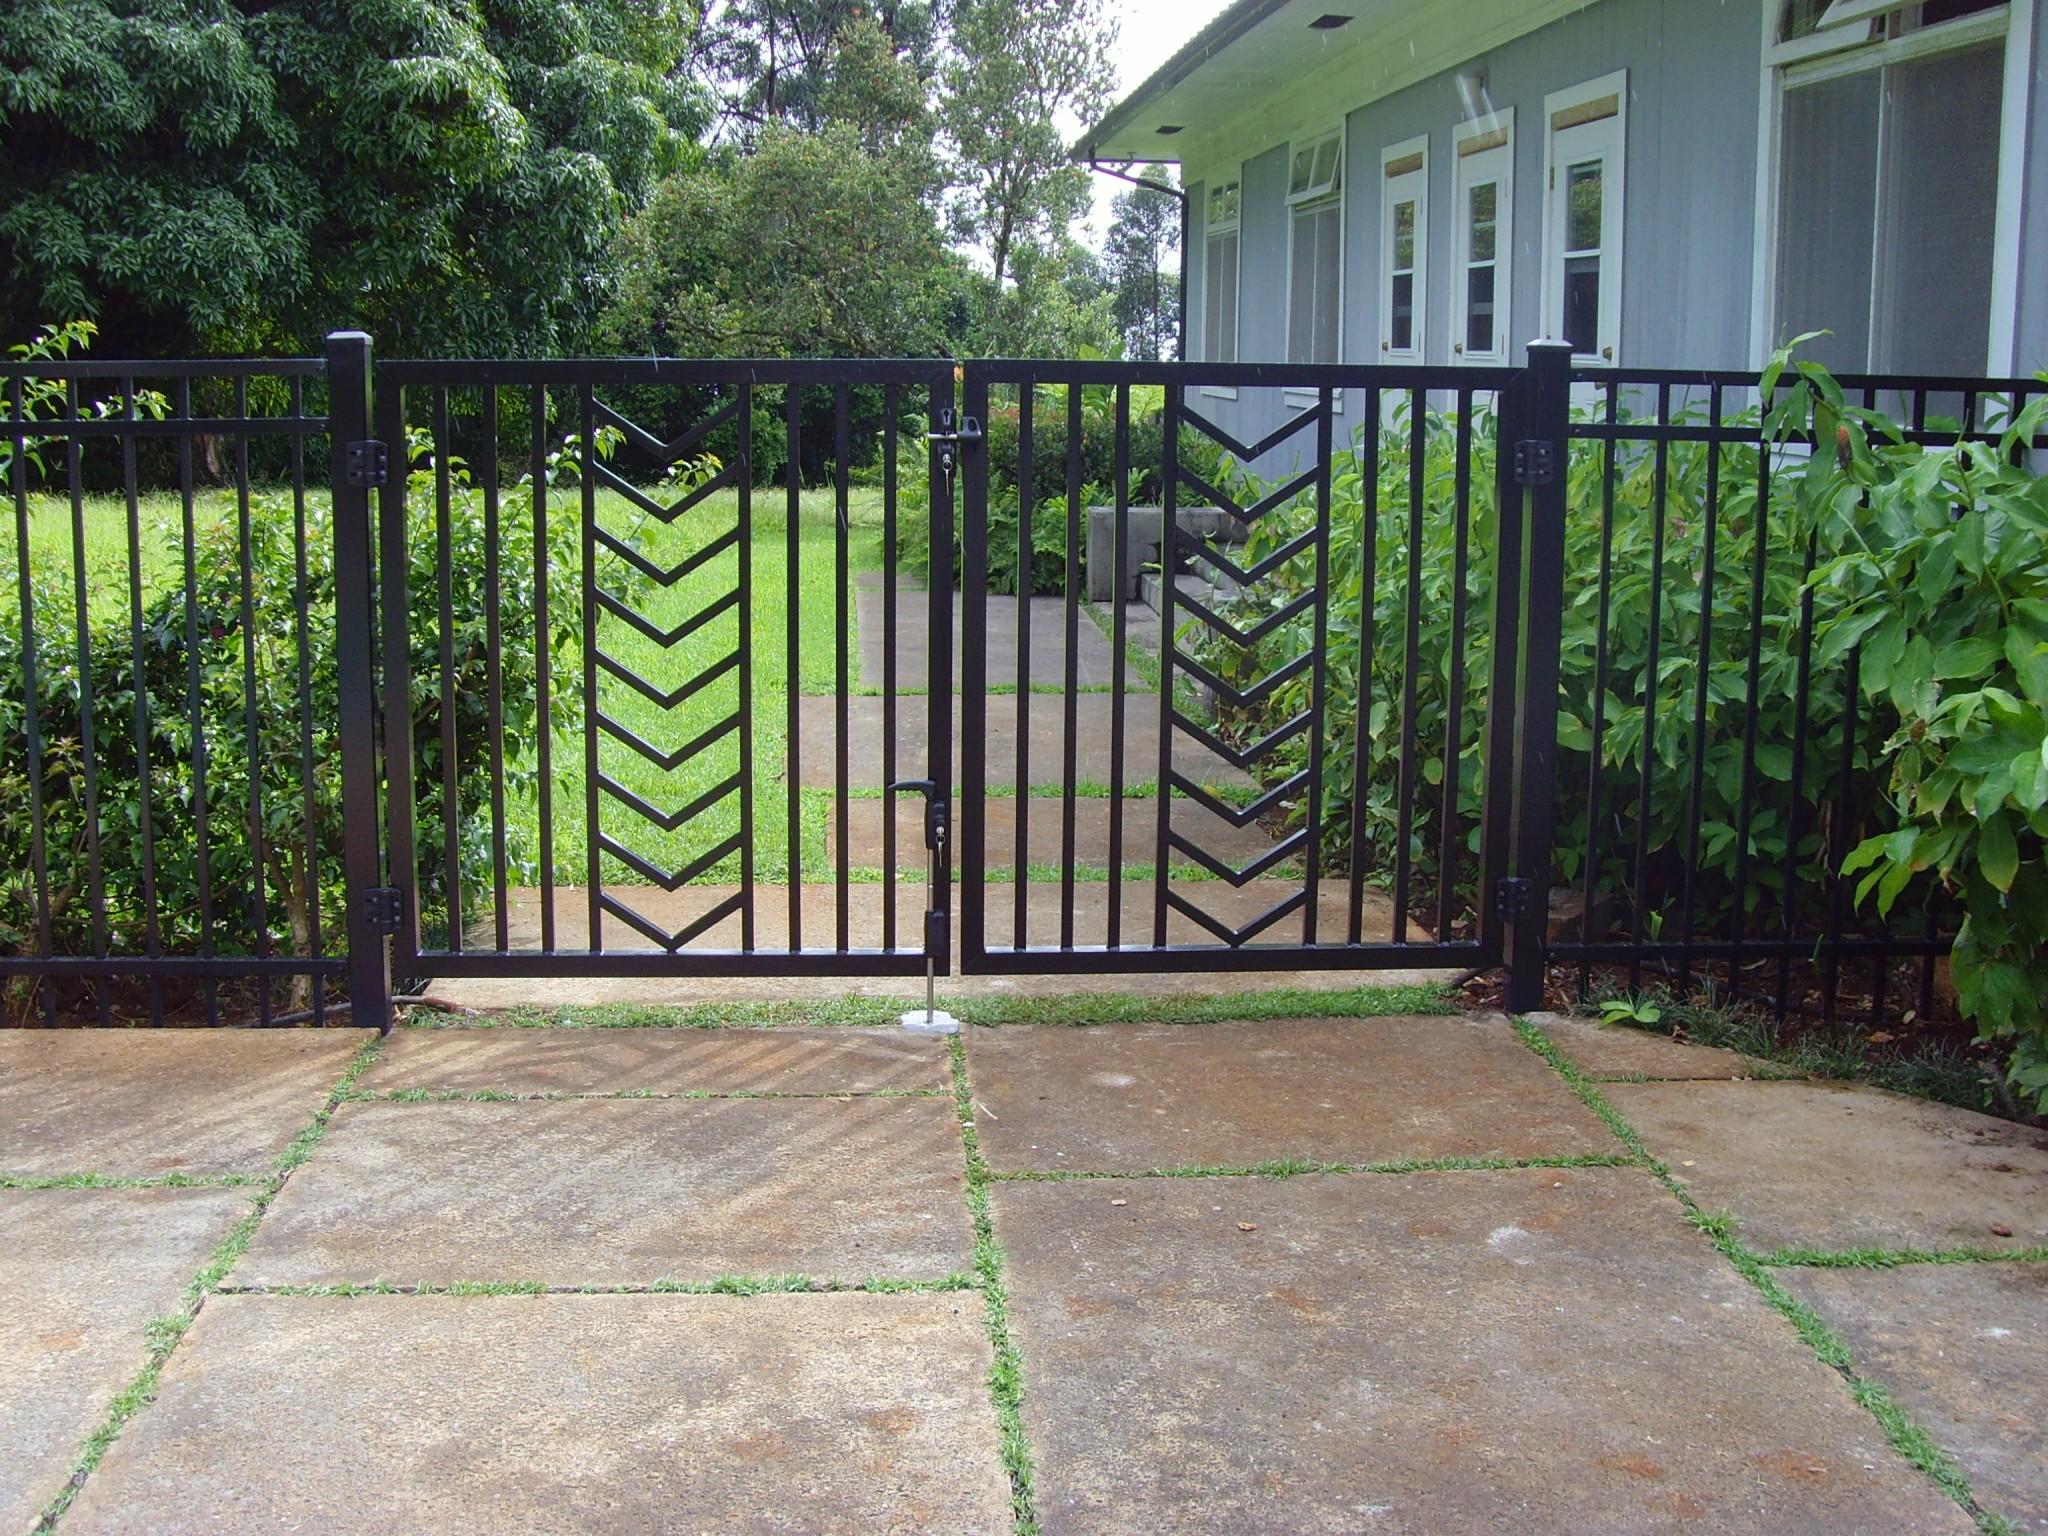 Hawaii Fence Project Gallery | Oahu, Hawaii | Allied Security Fence